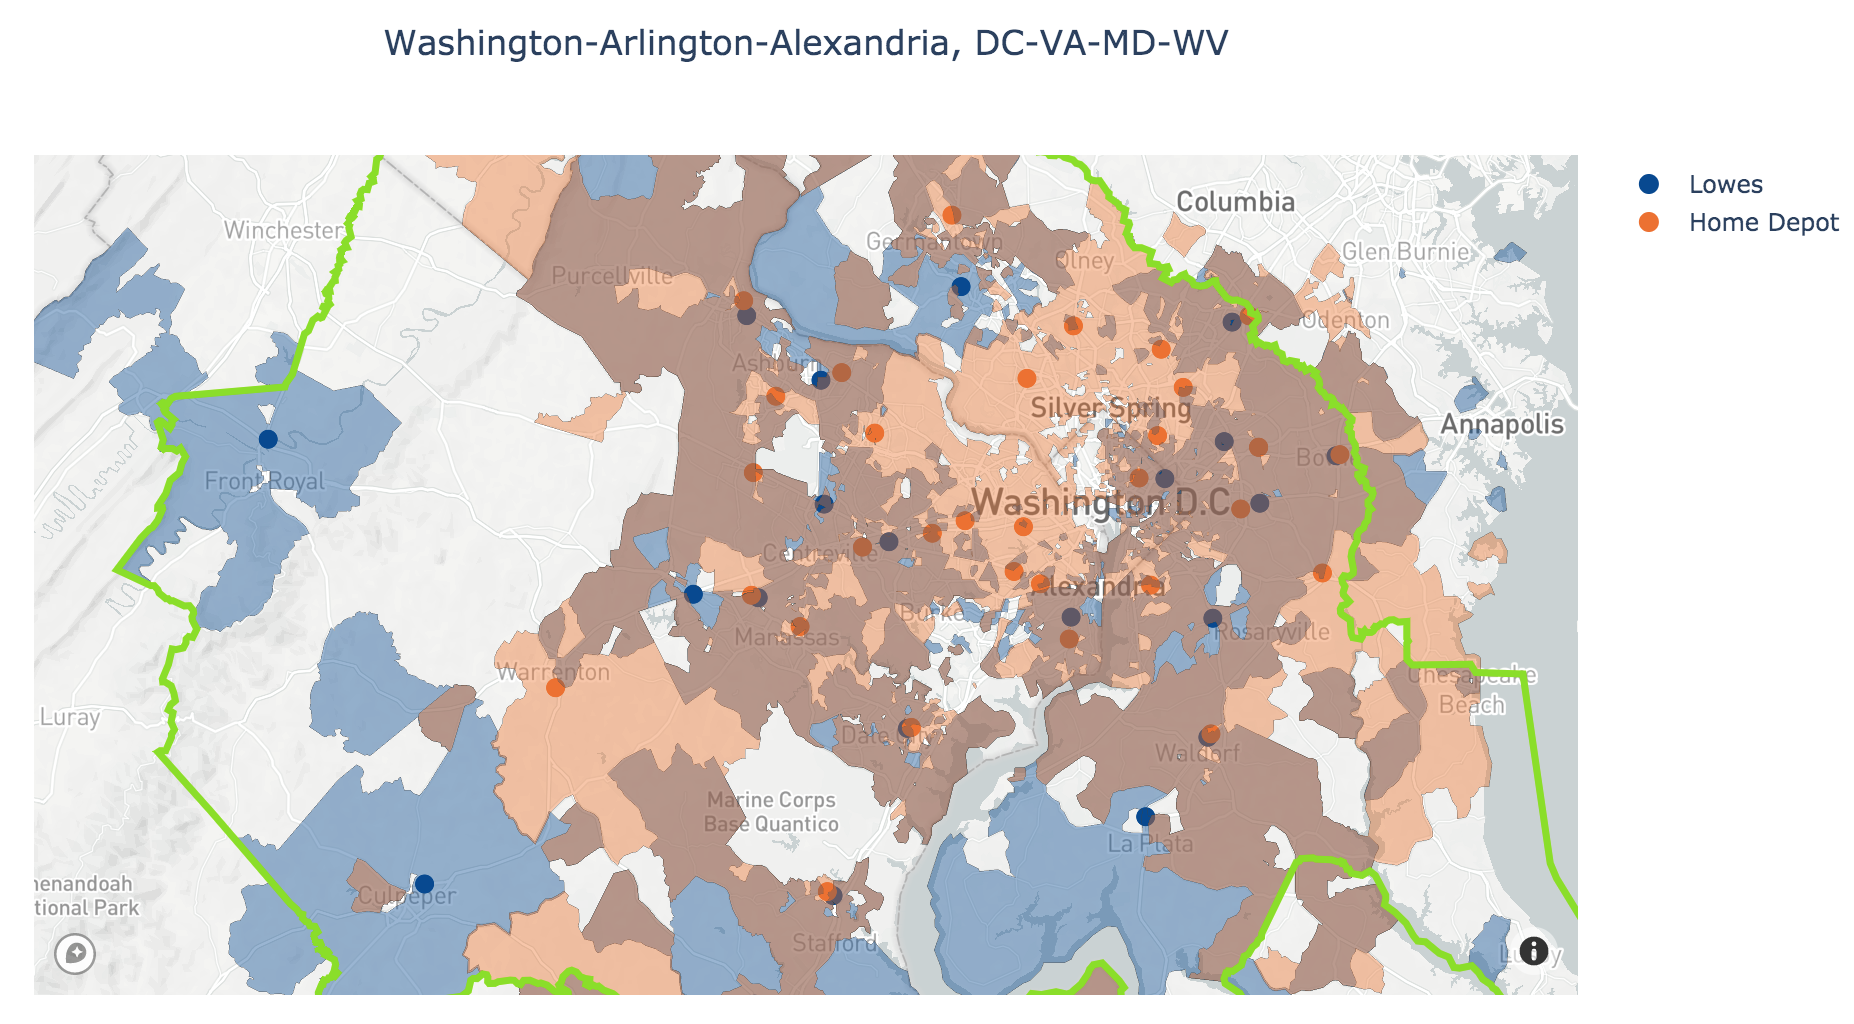 Home Depot and Lowes Trade Areas in Washington-Arlington-Alexandria